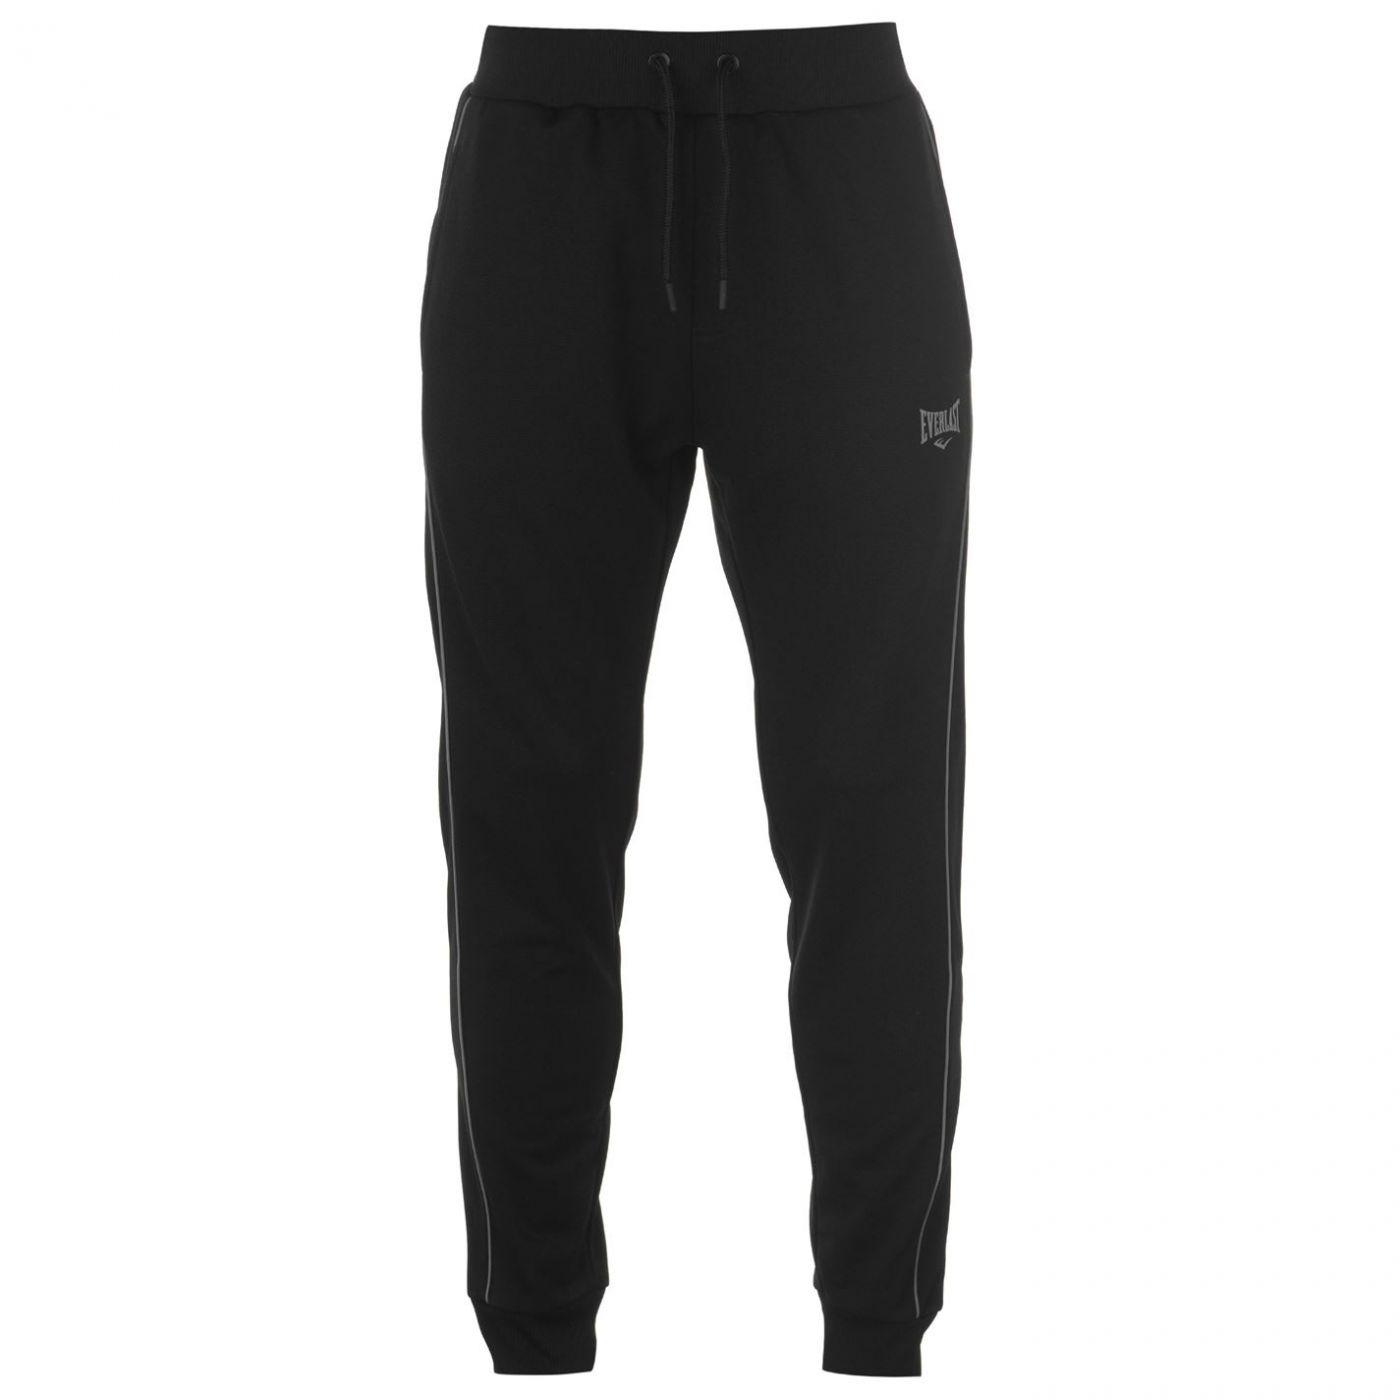 Everlast Ref Jogging Pants Mens